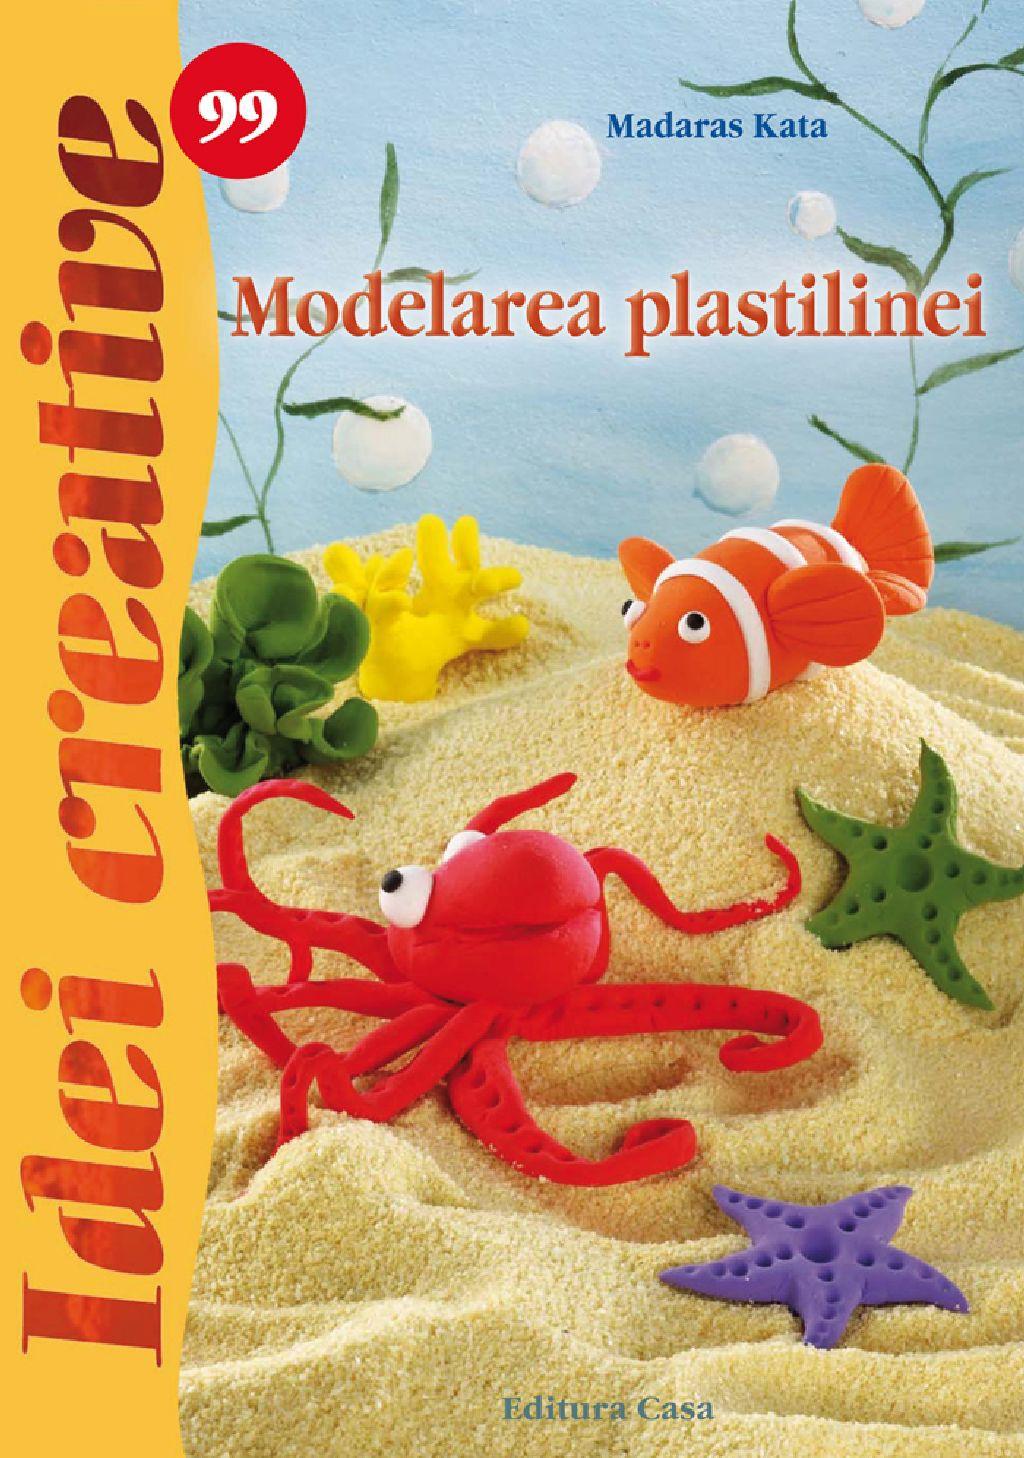 Modelarea Plastilinei - Idei Creative 99